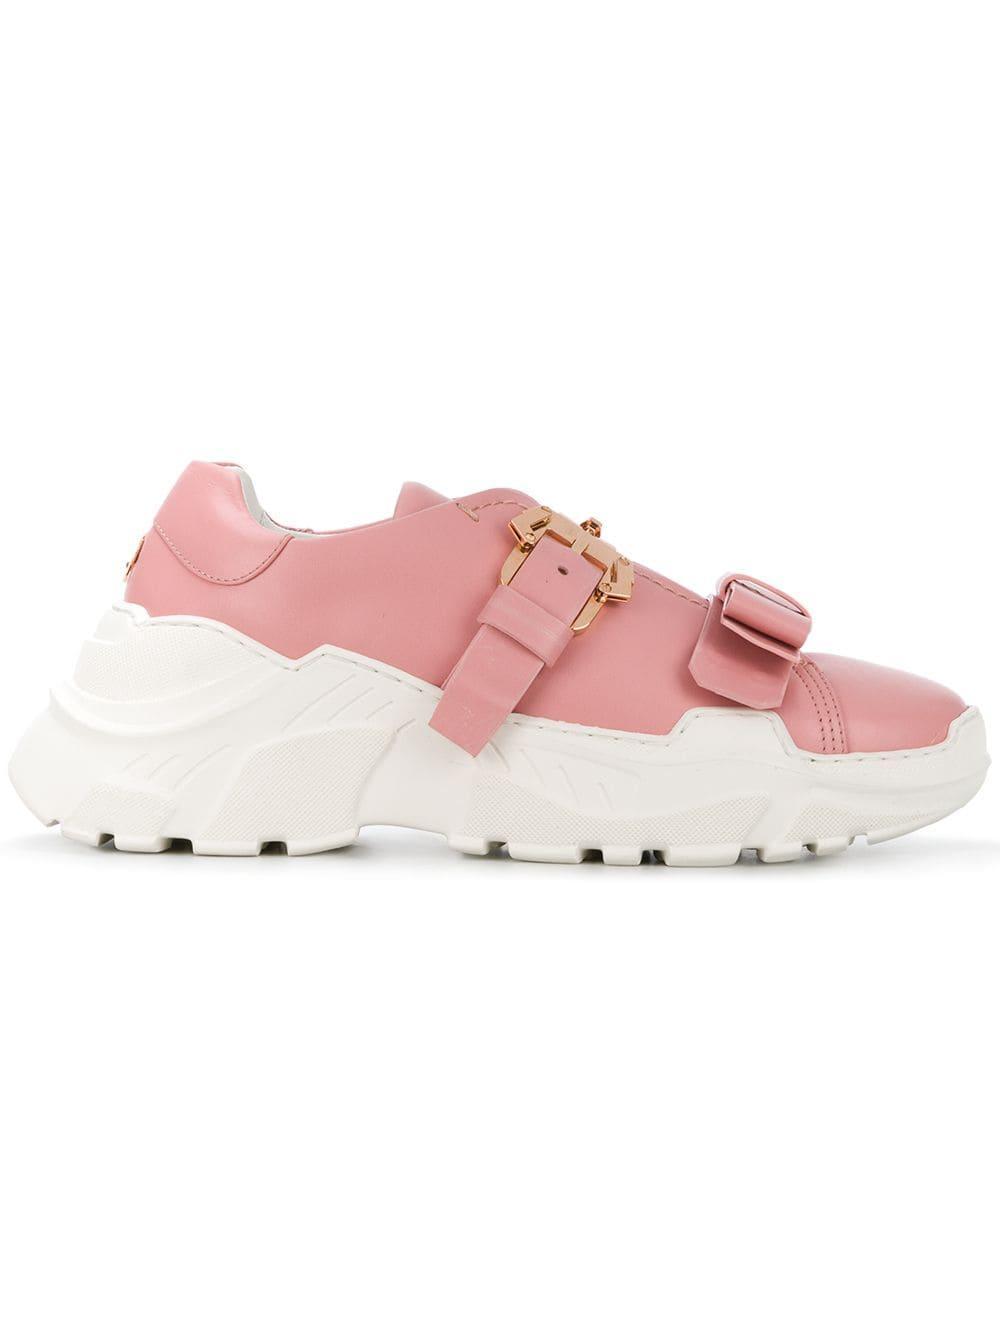 In 'yokoo' Schnalle Mit Damen Sneakers Pink WEI2DH9Y